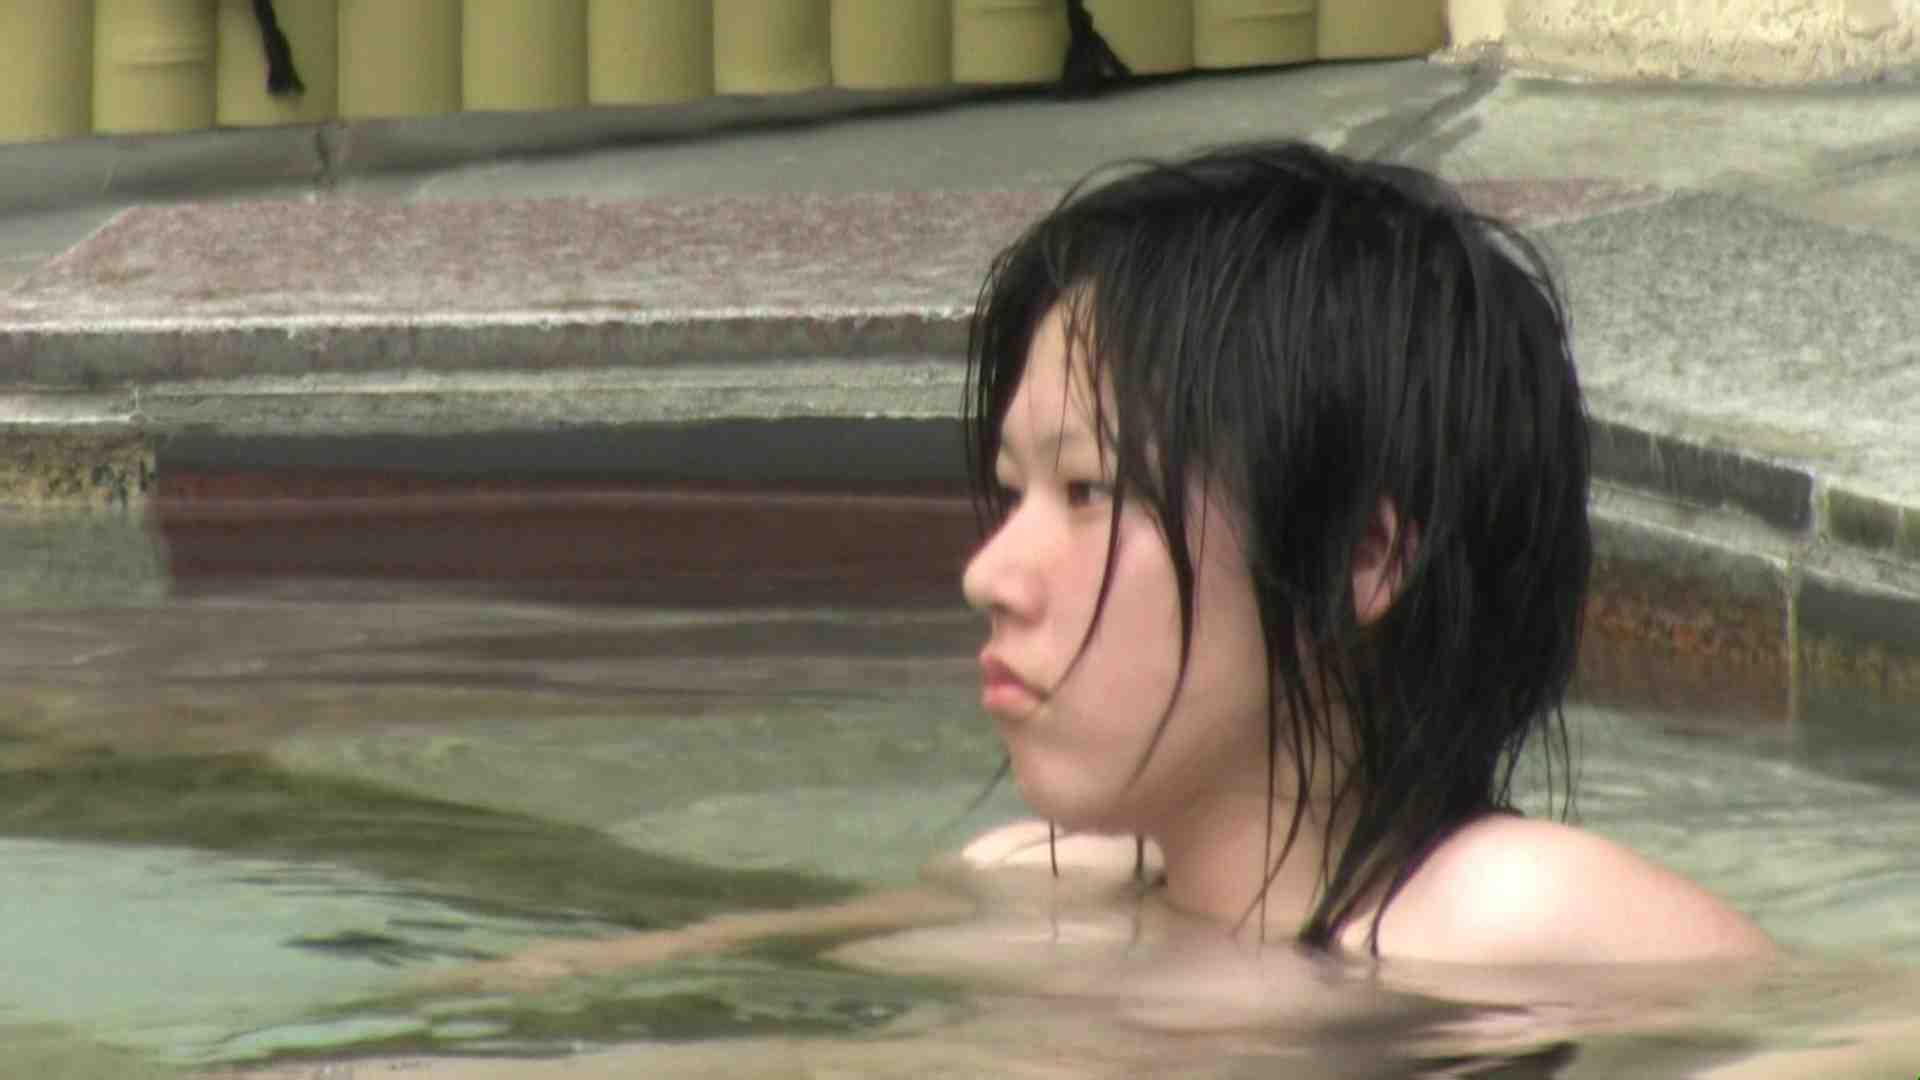 Aquaな露天風呂Vol.36 盗撮 | HなOL  68pic 66